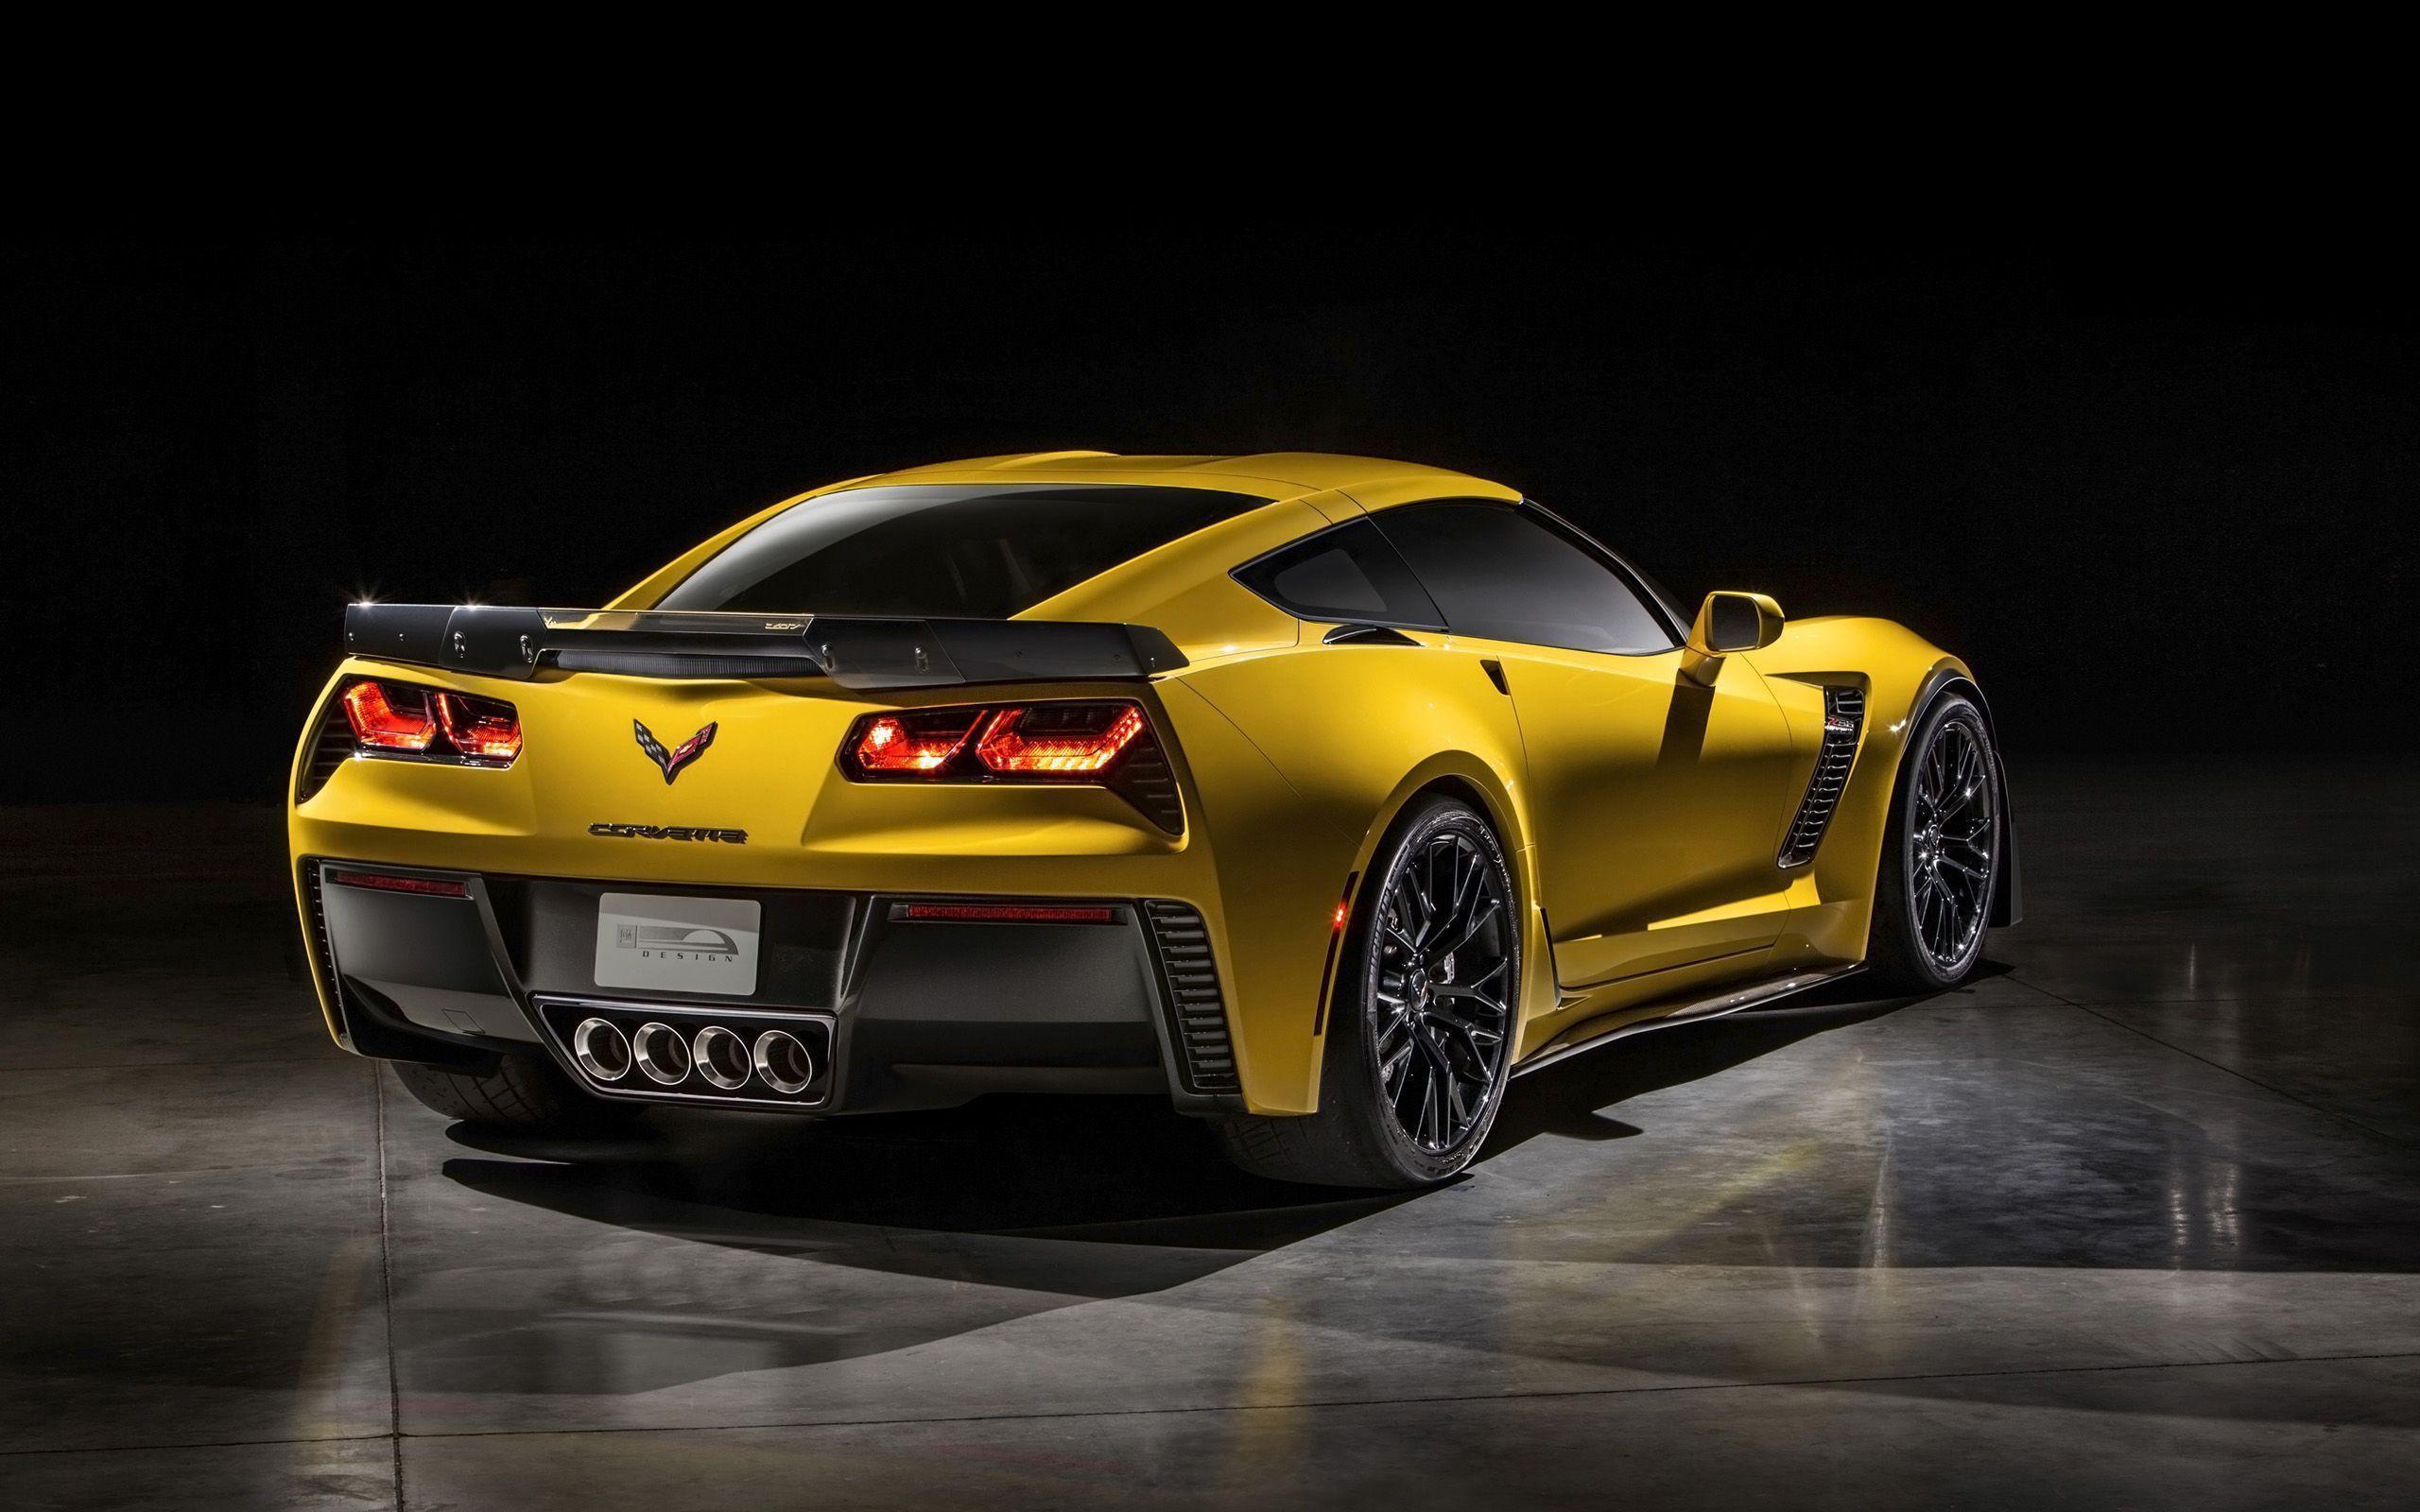 Corvette stingray 2017 wallpapers hd wallpaper cave - Corvette wallpaper ...